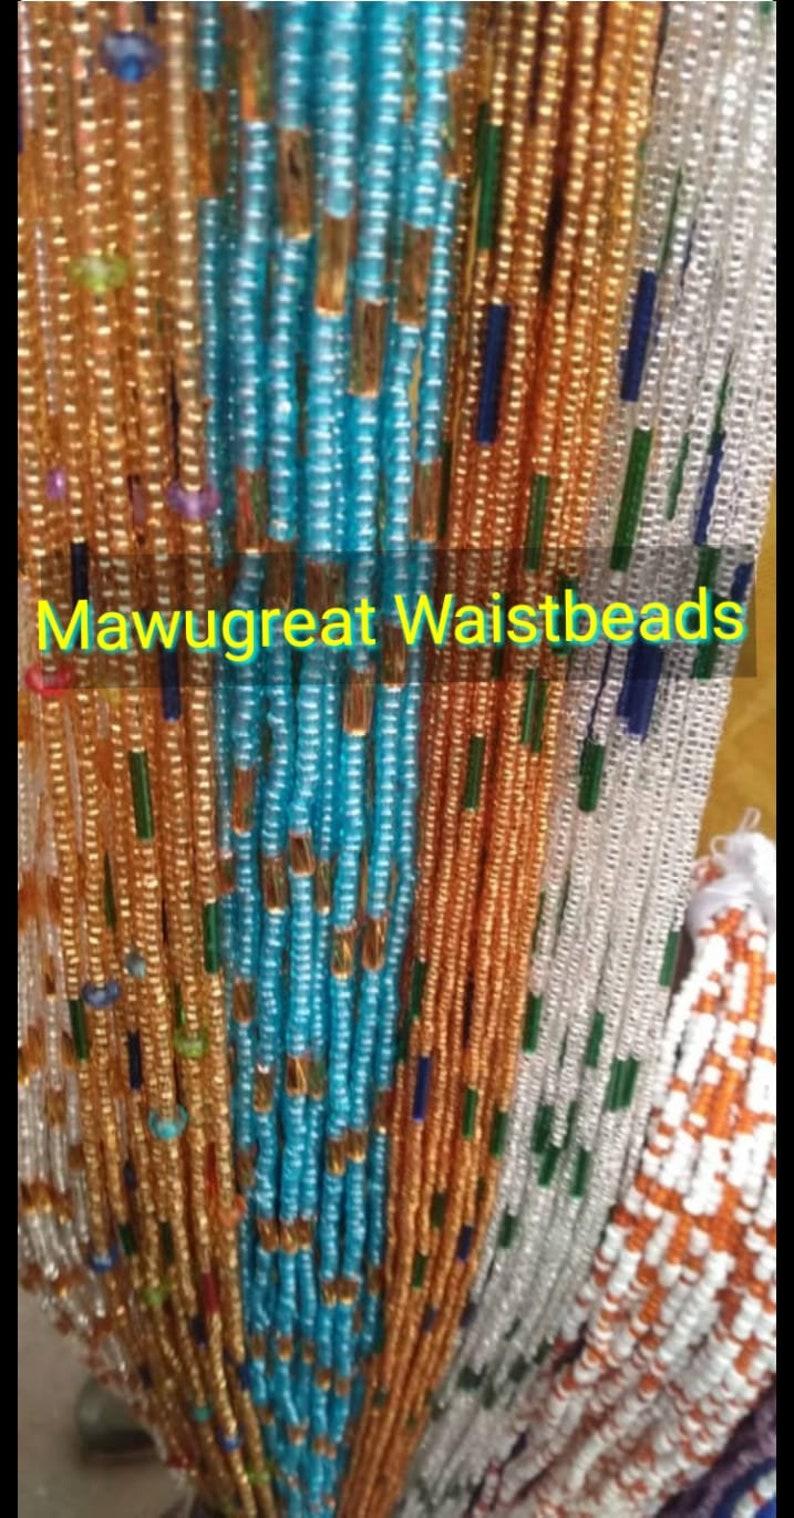 Waist beadsWholesale waist beads